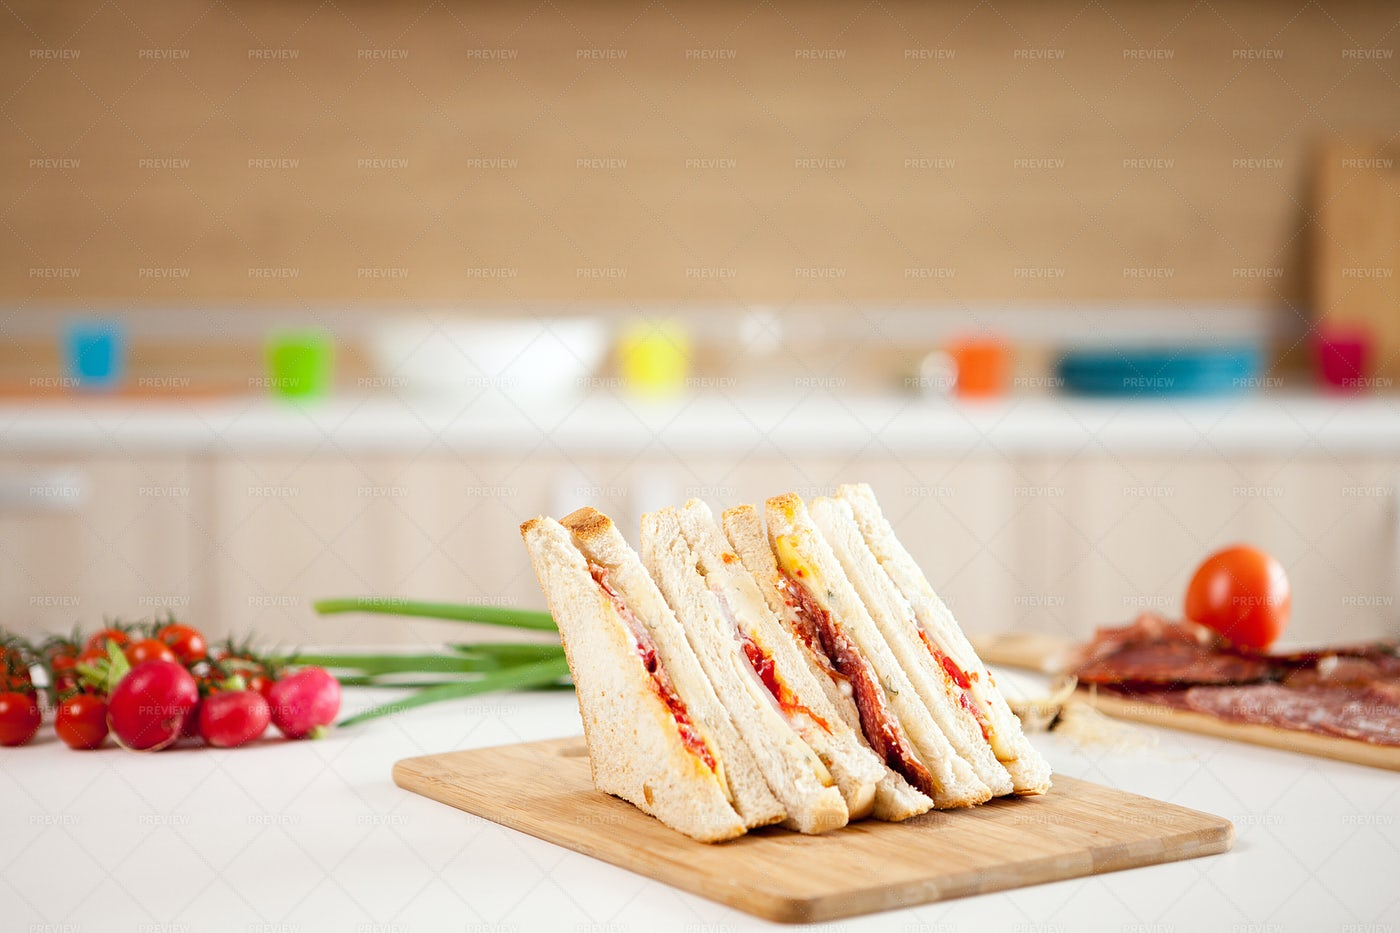 Fresh Sandwiches On Wooden Board: Stock Photos